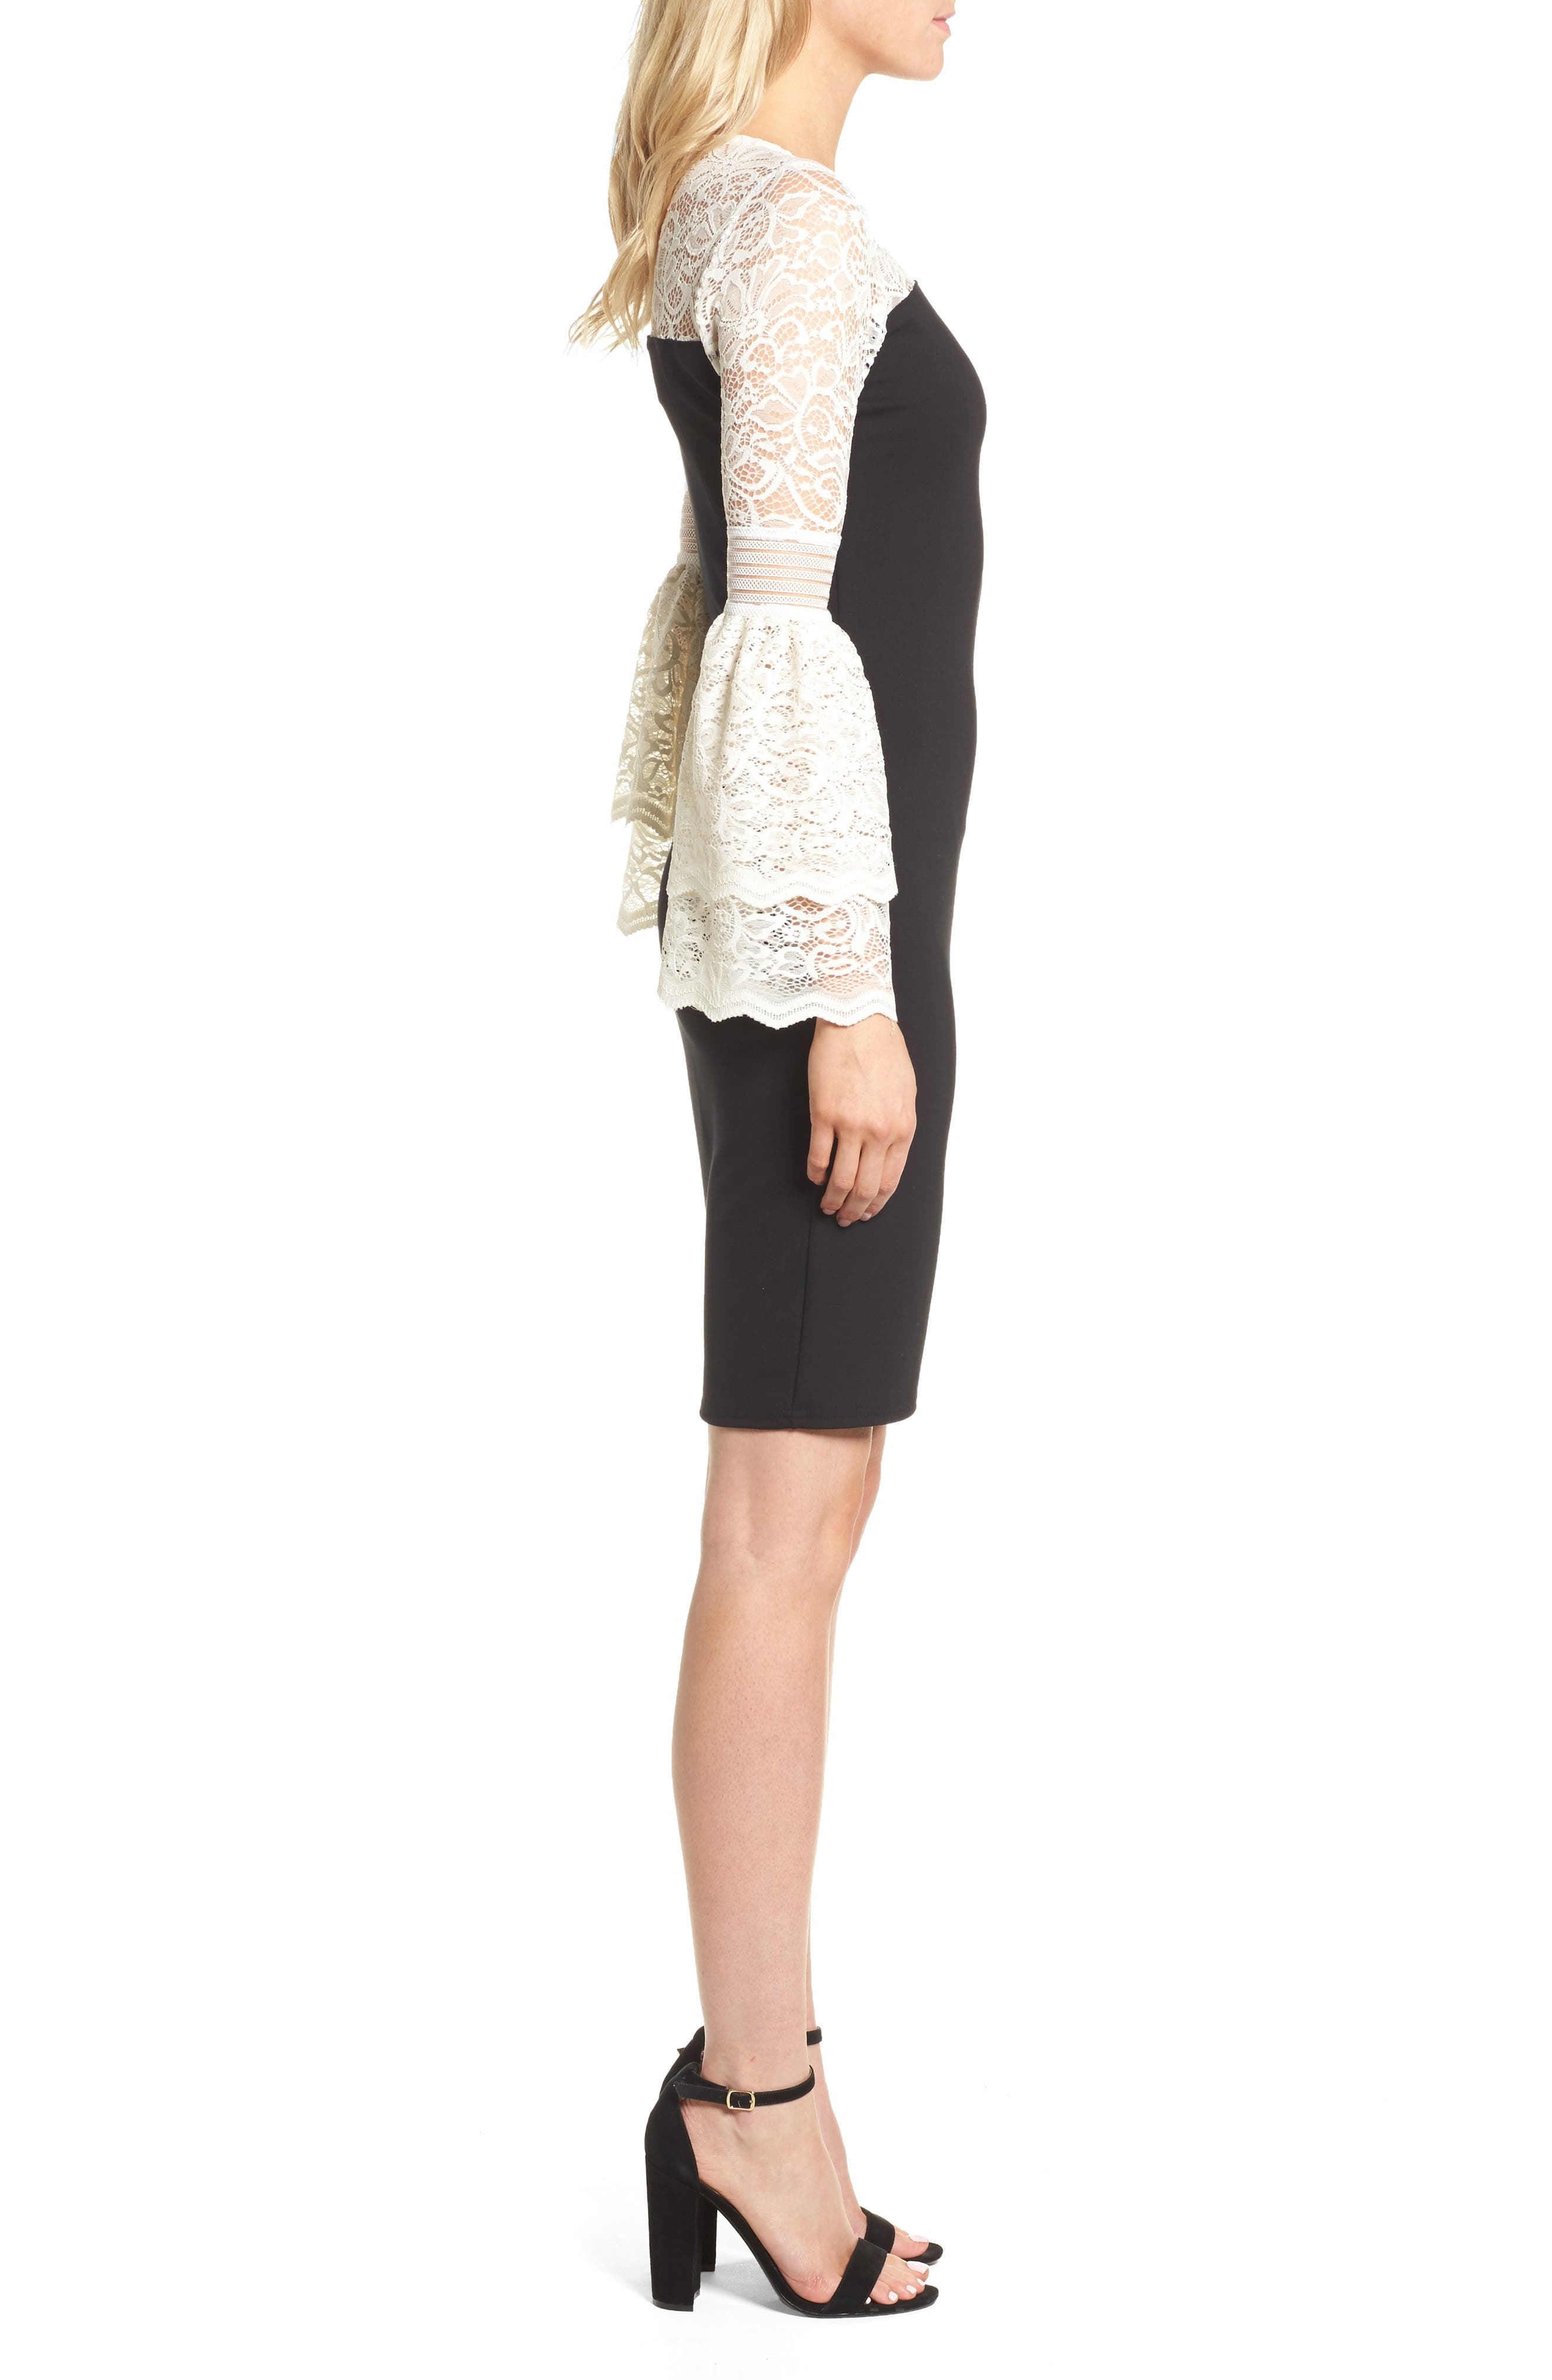 Floetry Bell Sleeve Sheath Dress,                             Alternate thumbnail 3, color,                             Cream Lace/ Black